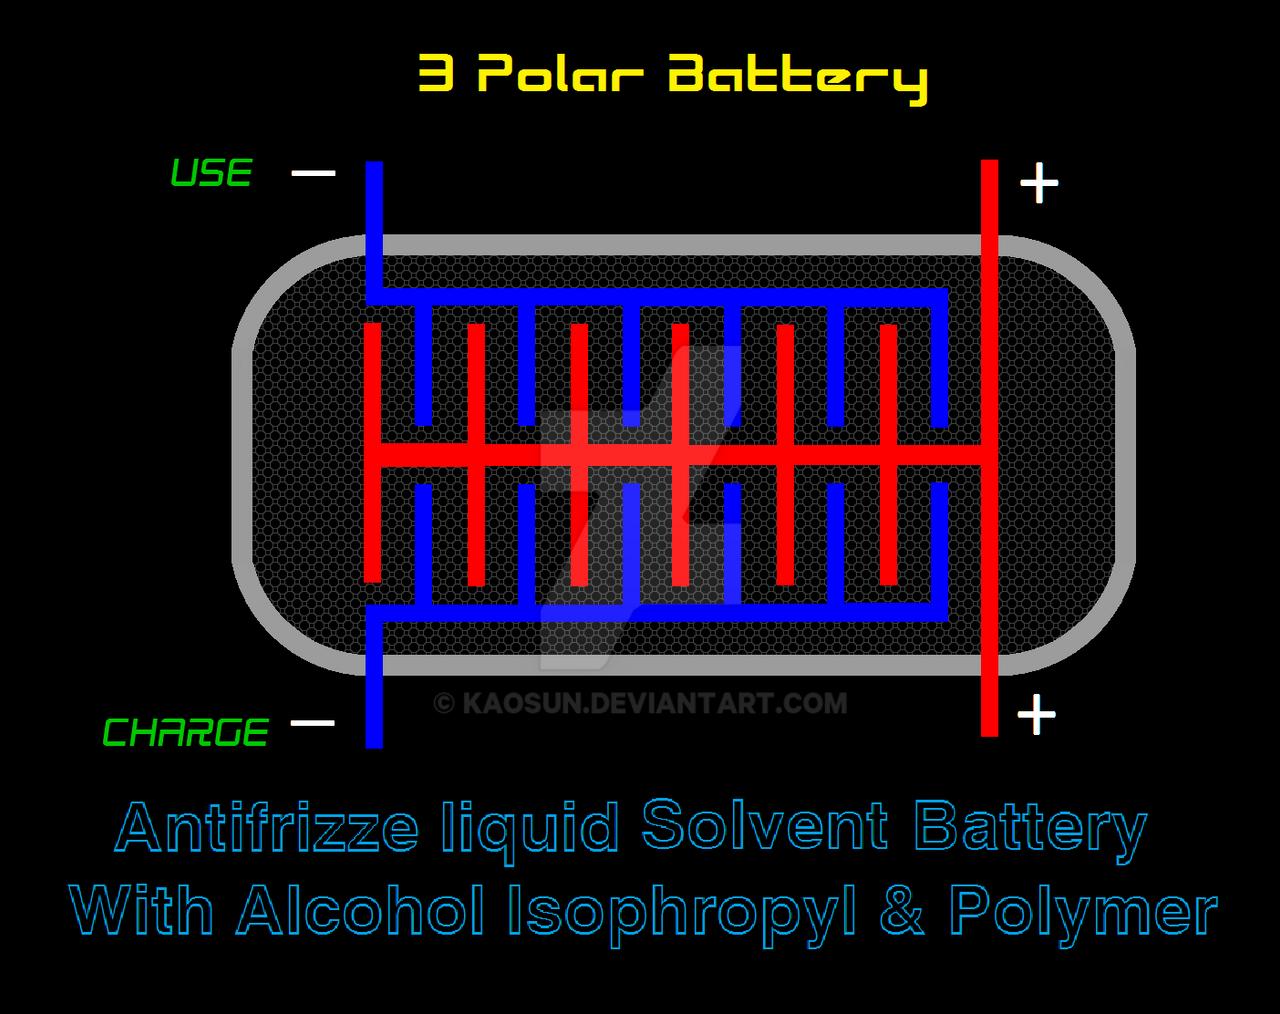 3polar Batery by Kaosun